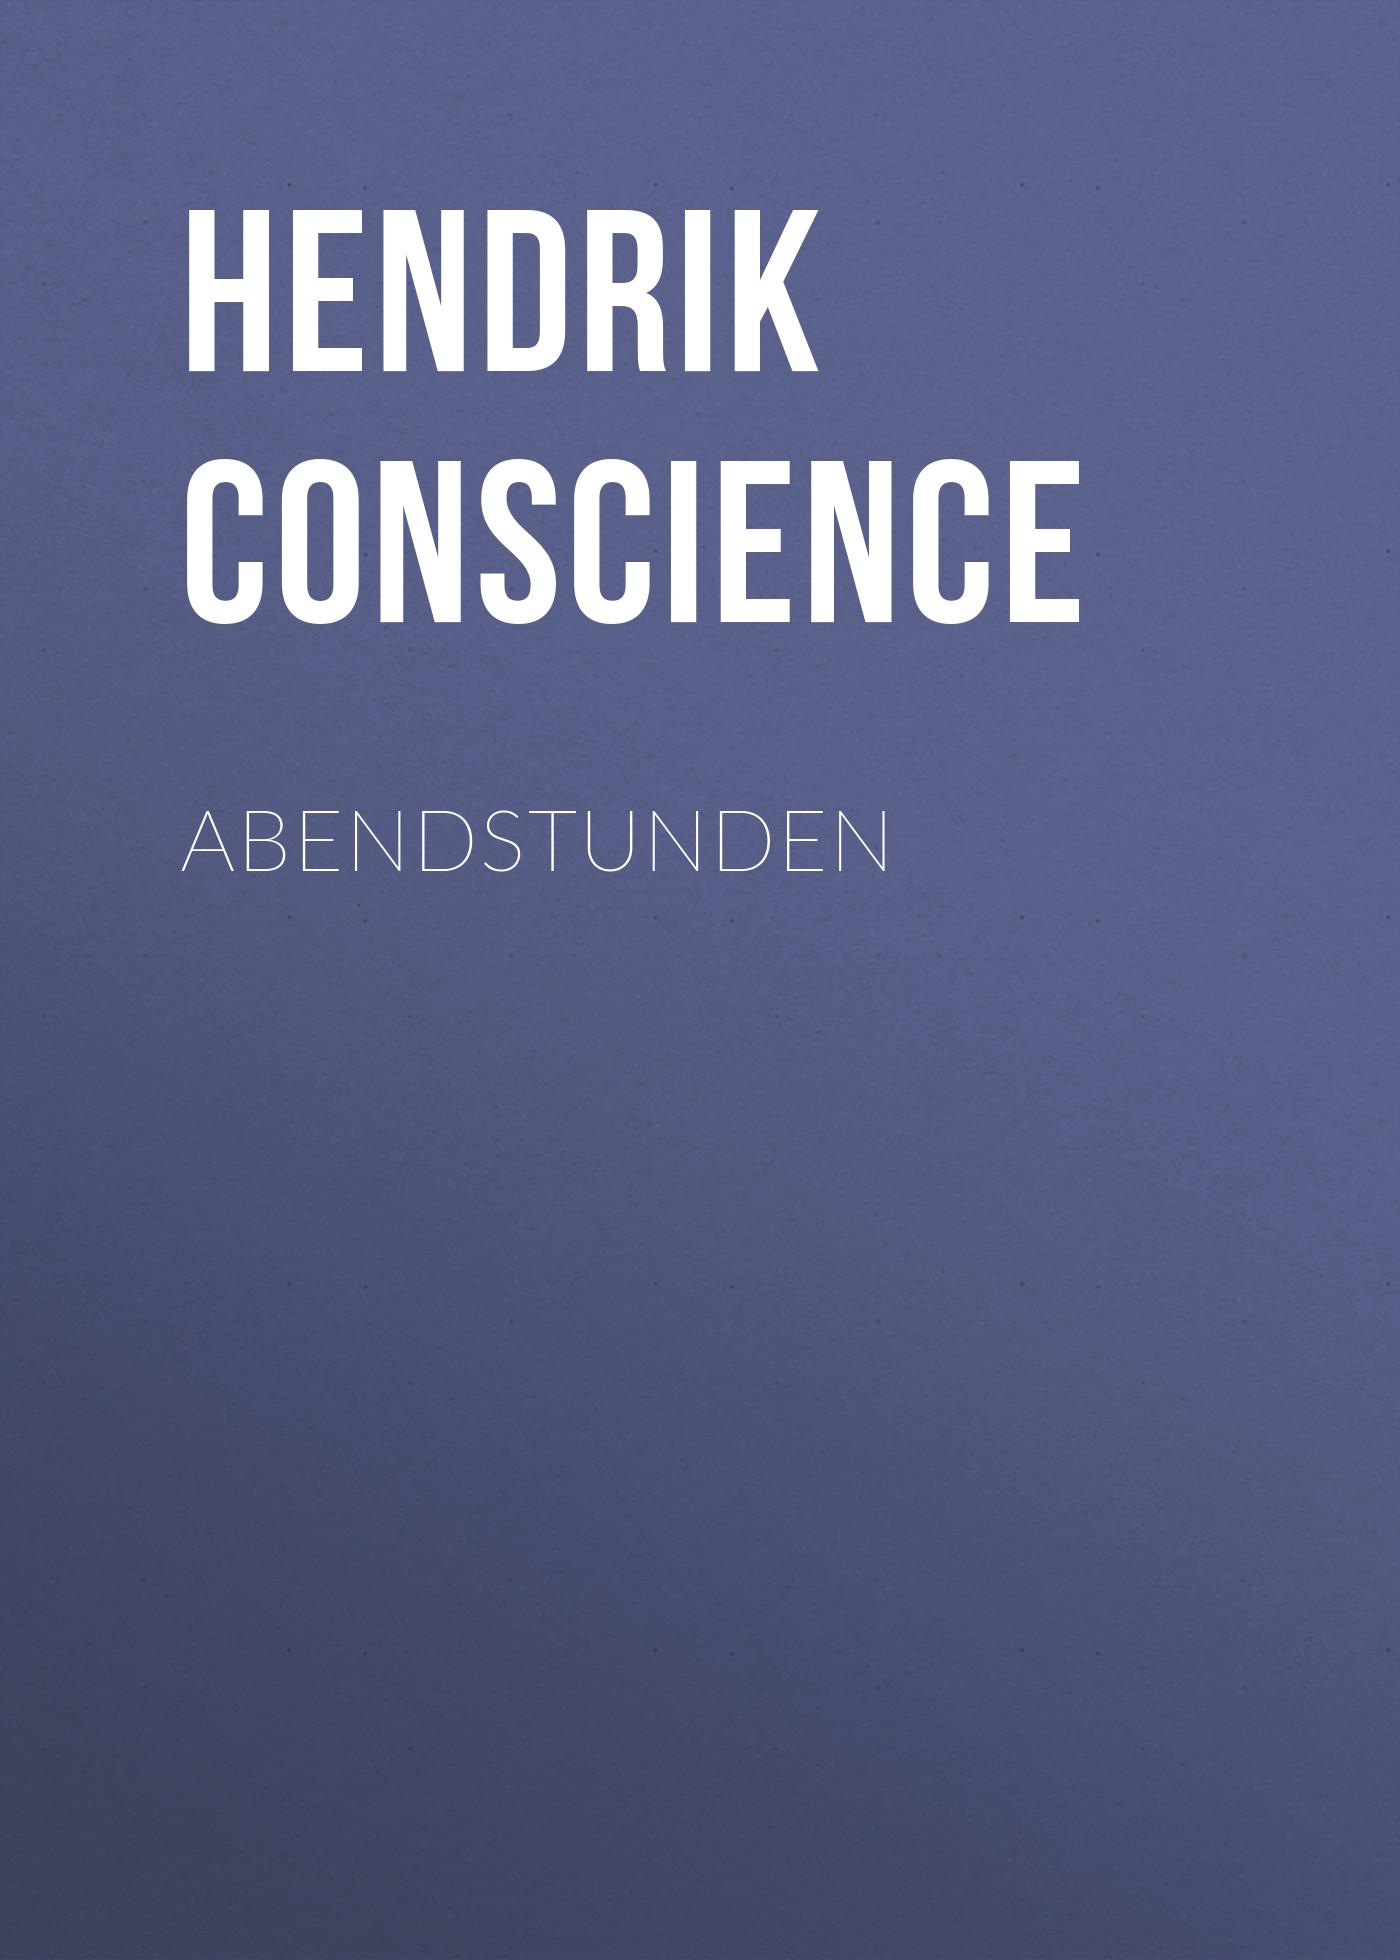 Hendrik Conscience Abendstunden ilves toomas hendrik suurem eesti